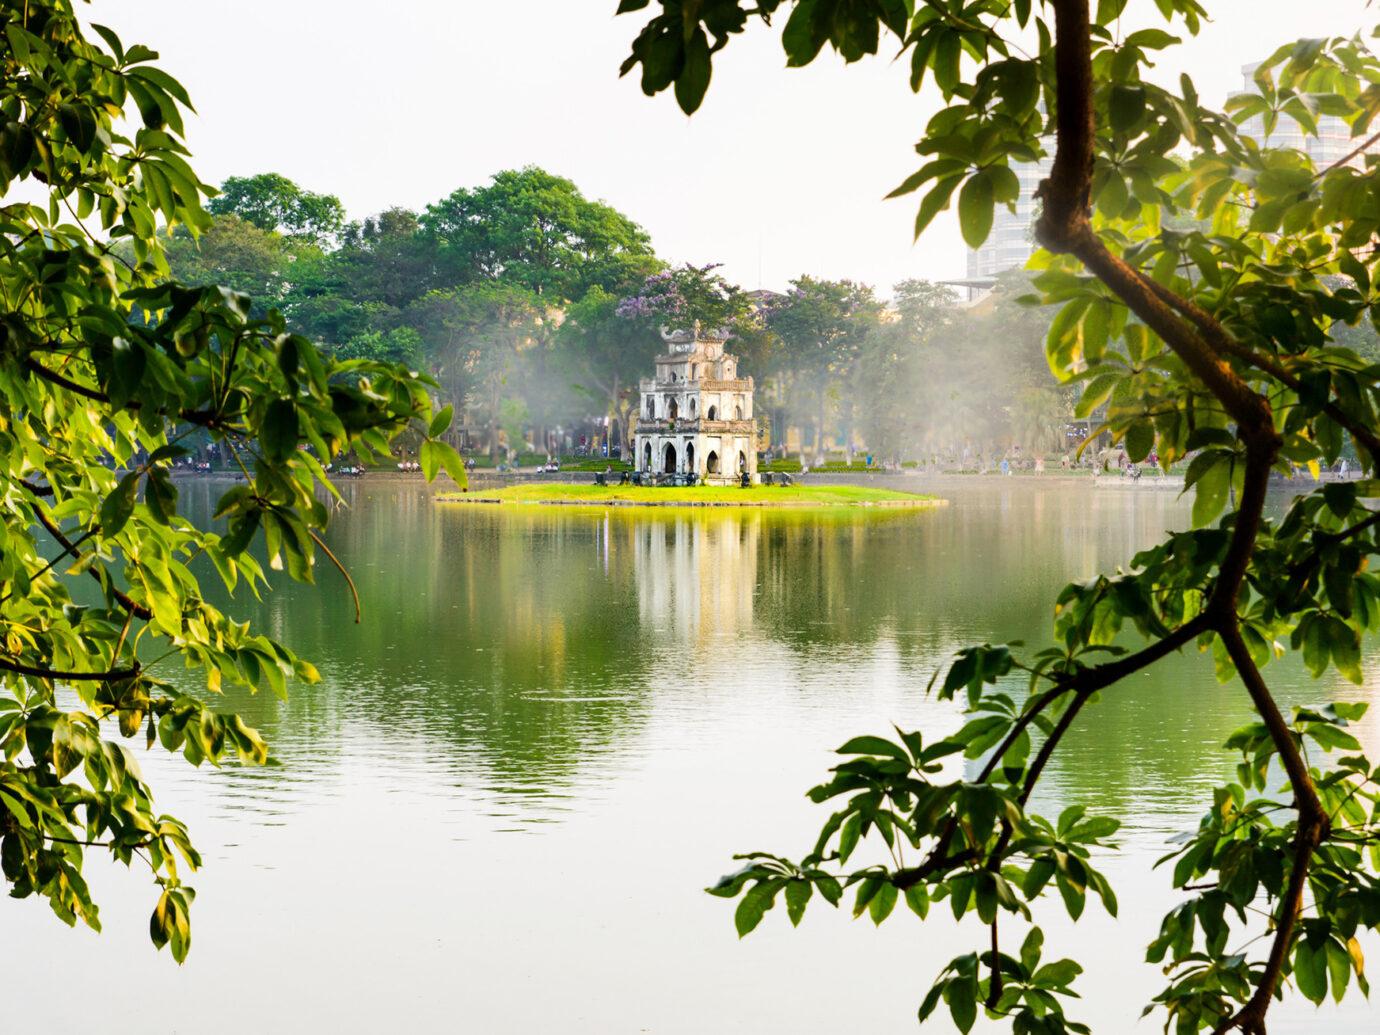 Turtle Tower in Hanoi Hoan Kiem foggy lake in Vietnam